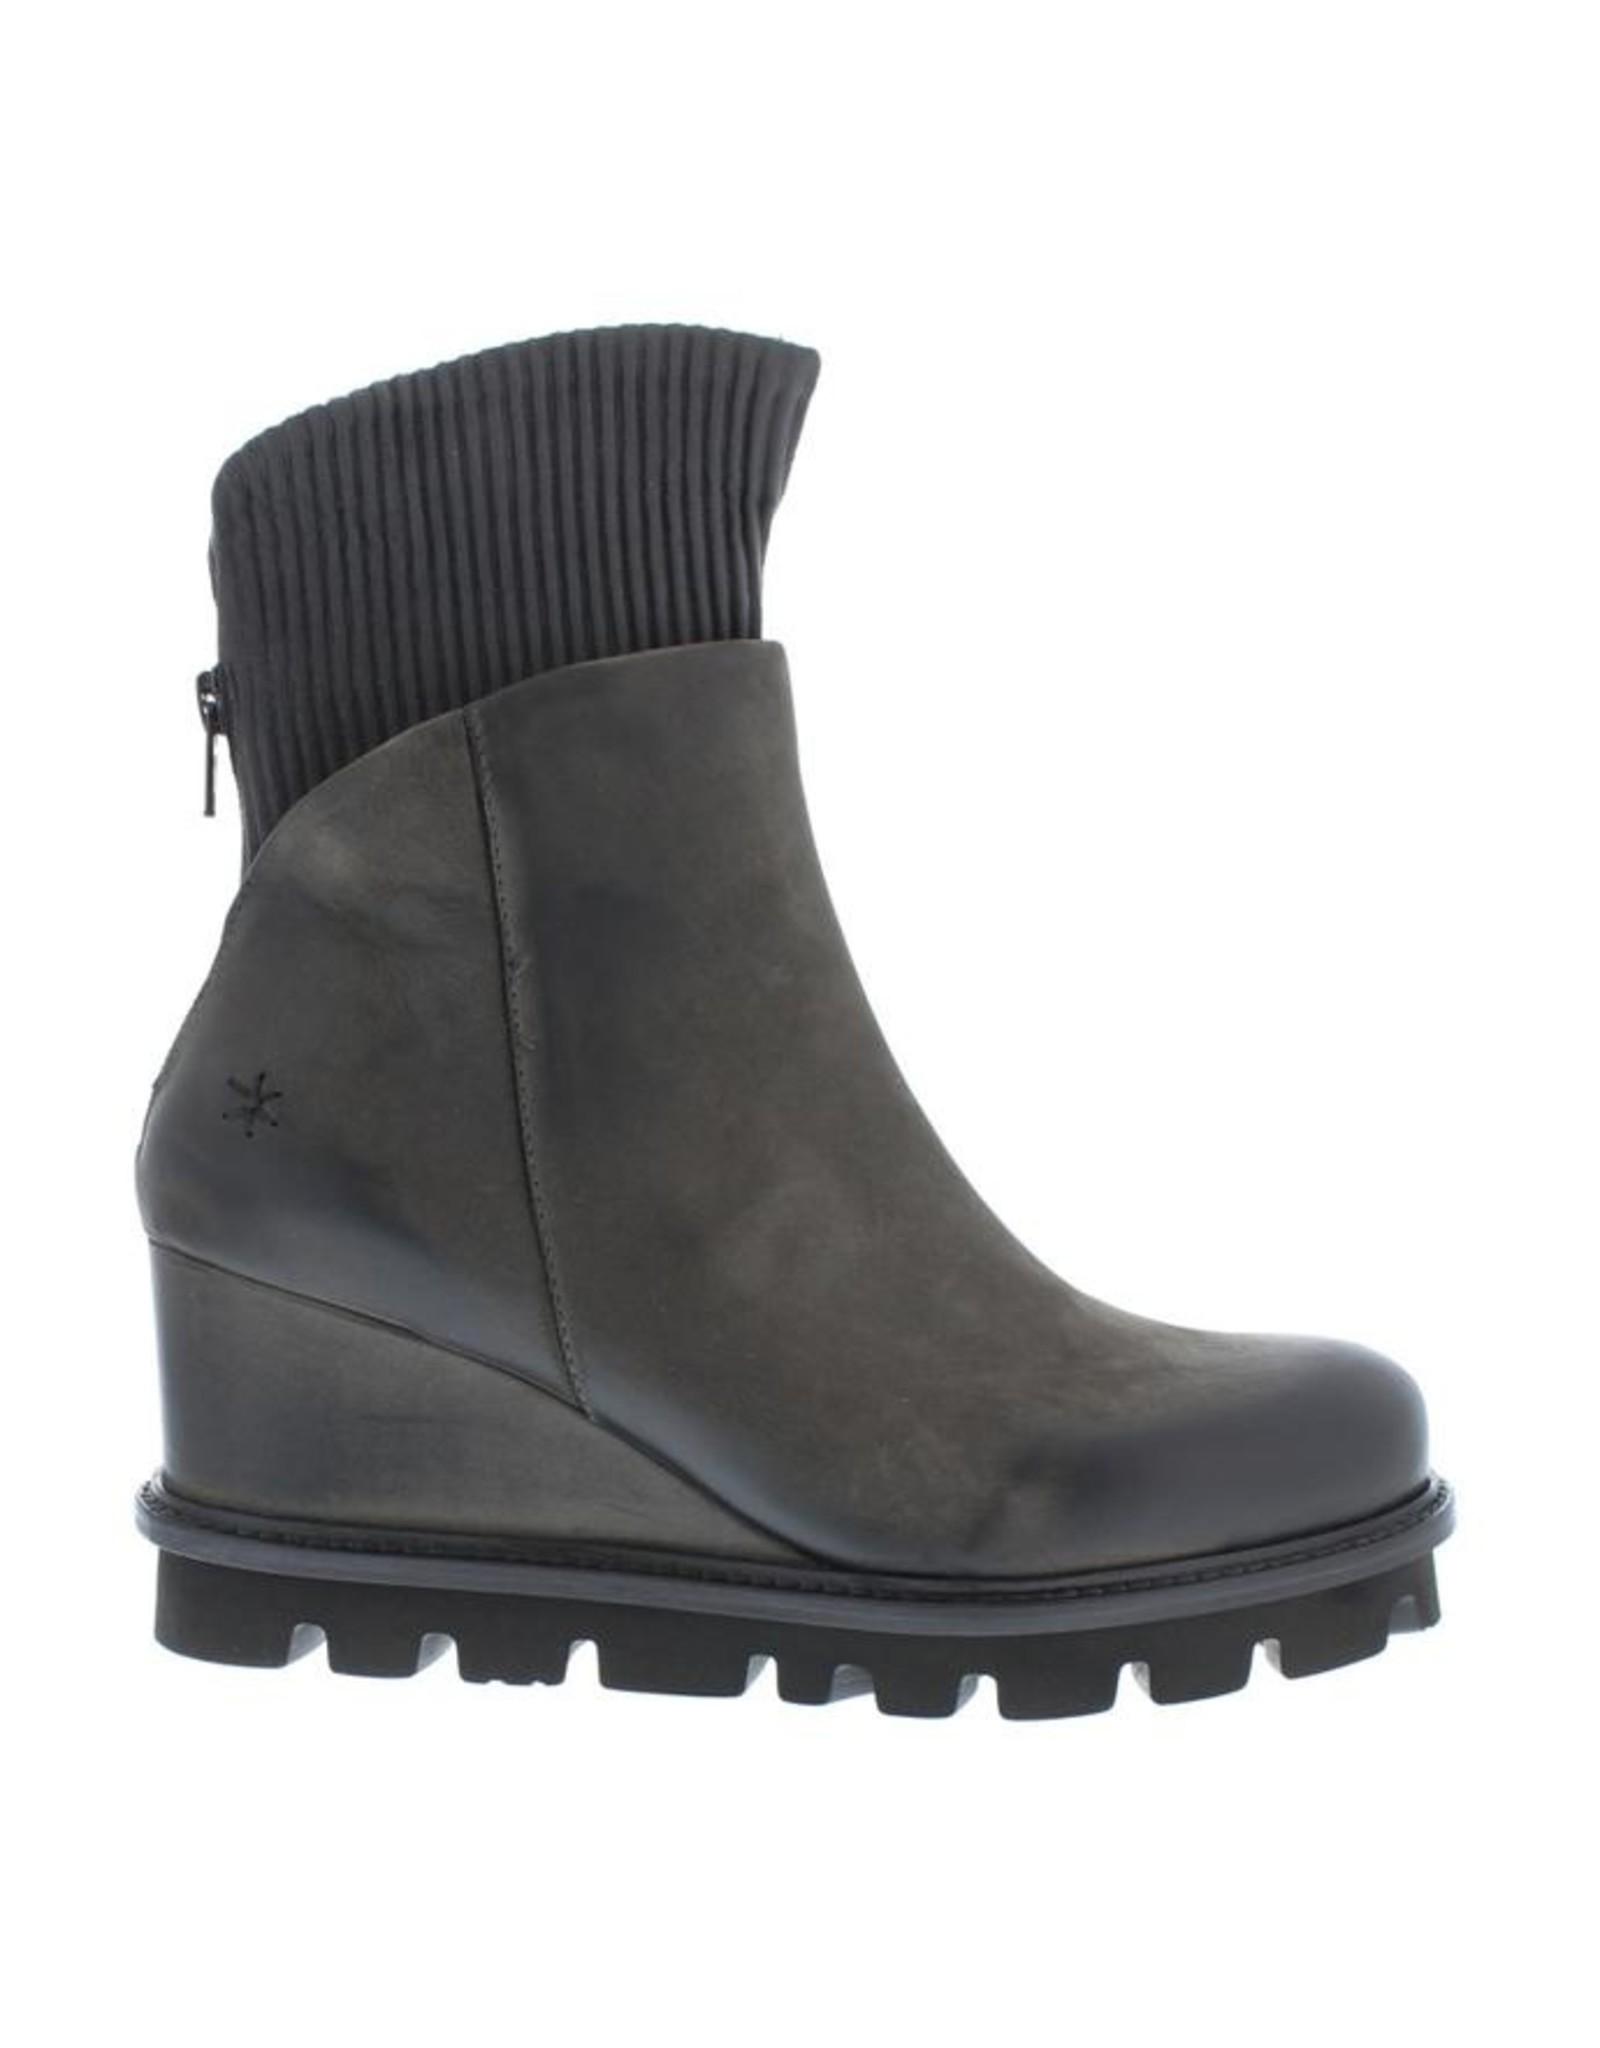 Patrizia Bonfanti Nana Nubuck Ankle Boots